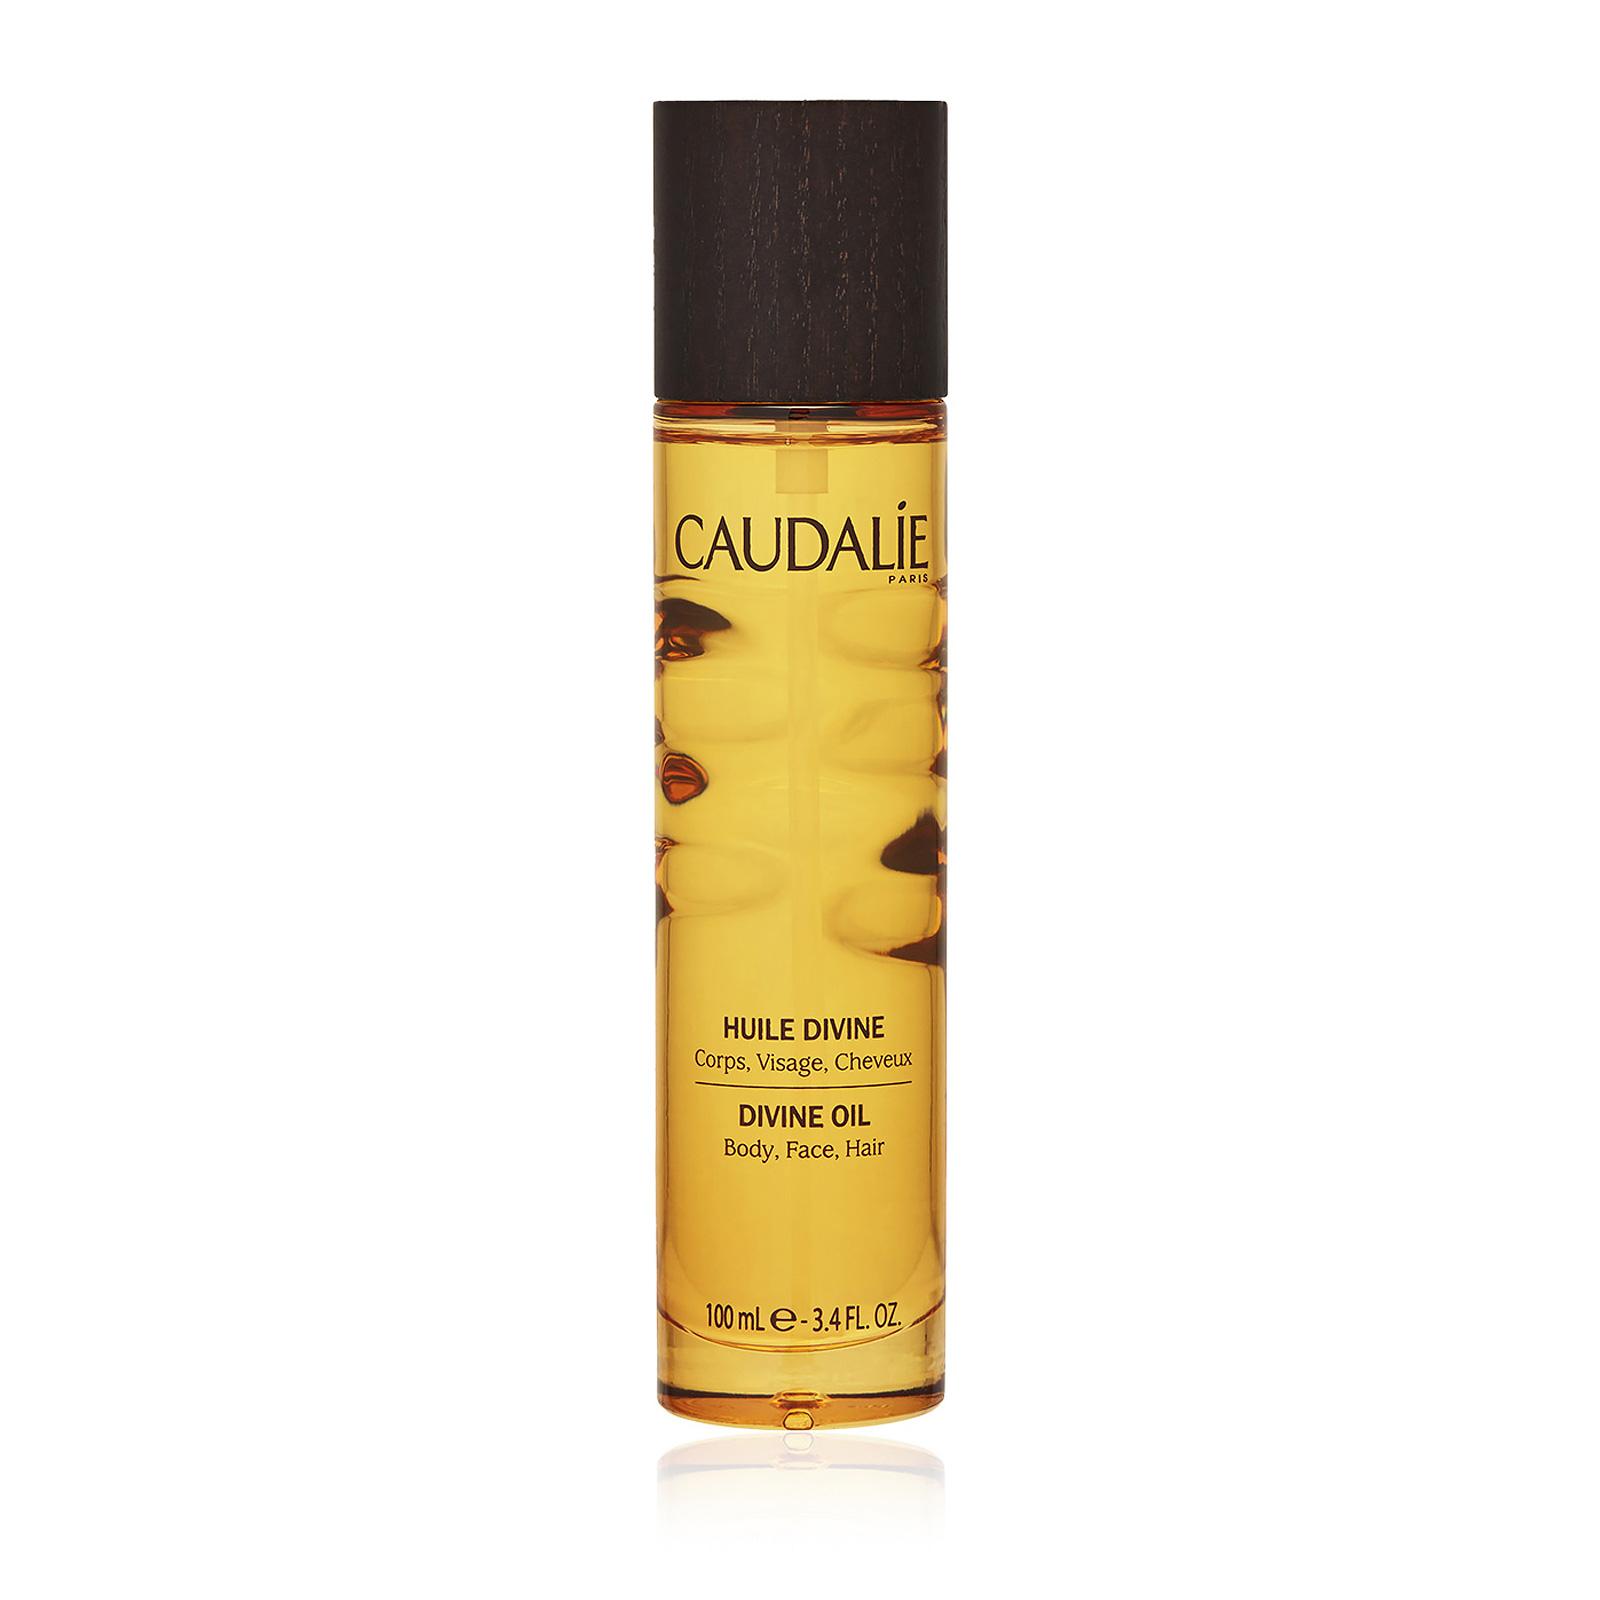 Divine Oil (Body, Face, Hair)